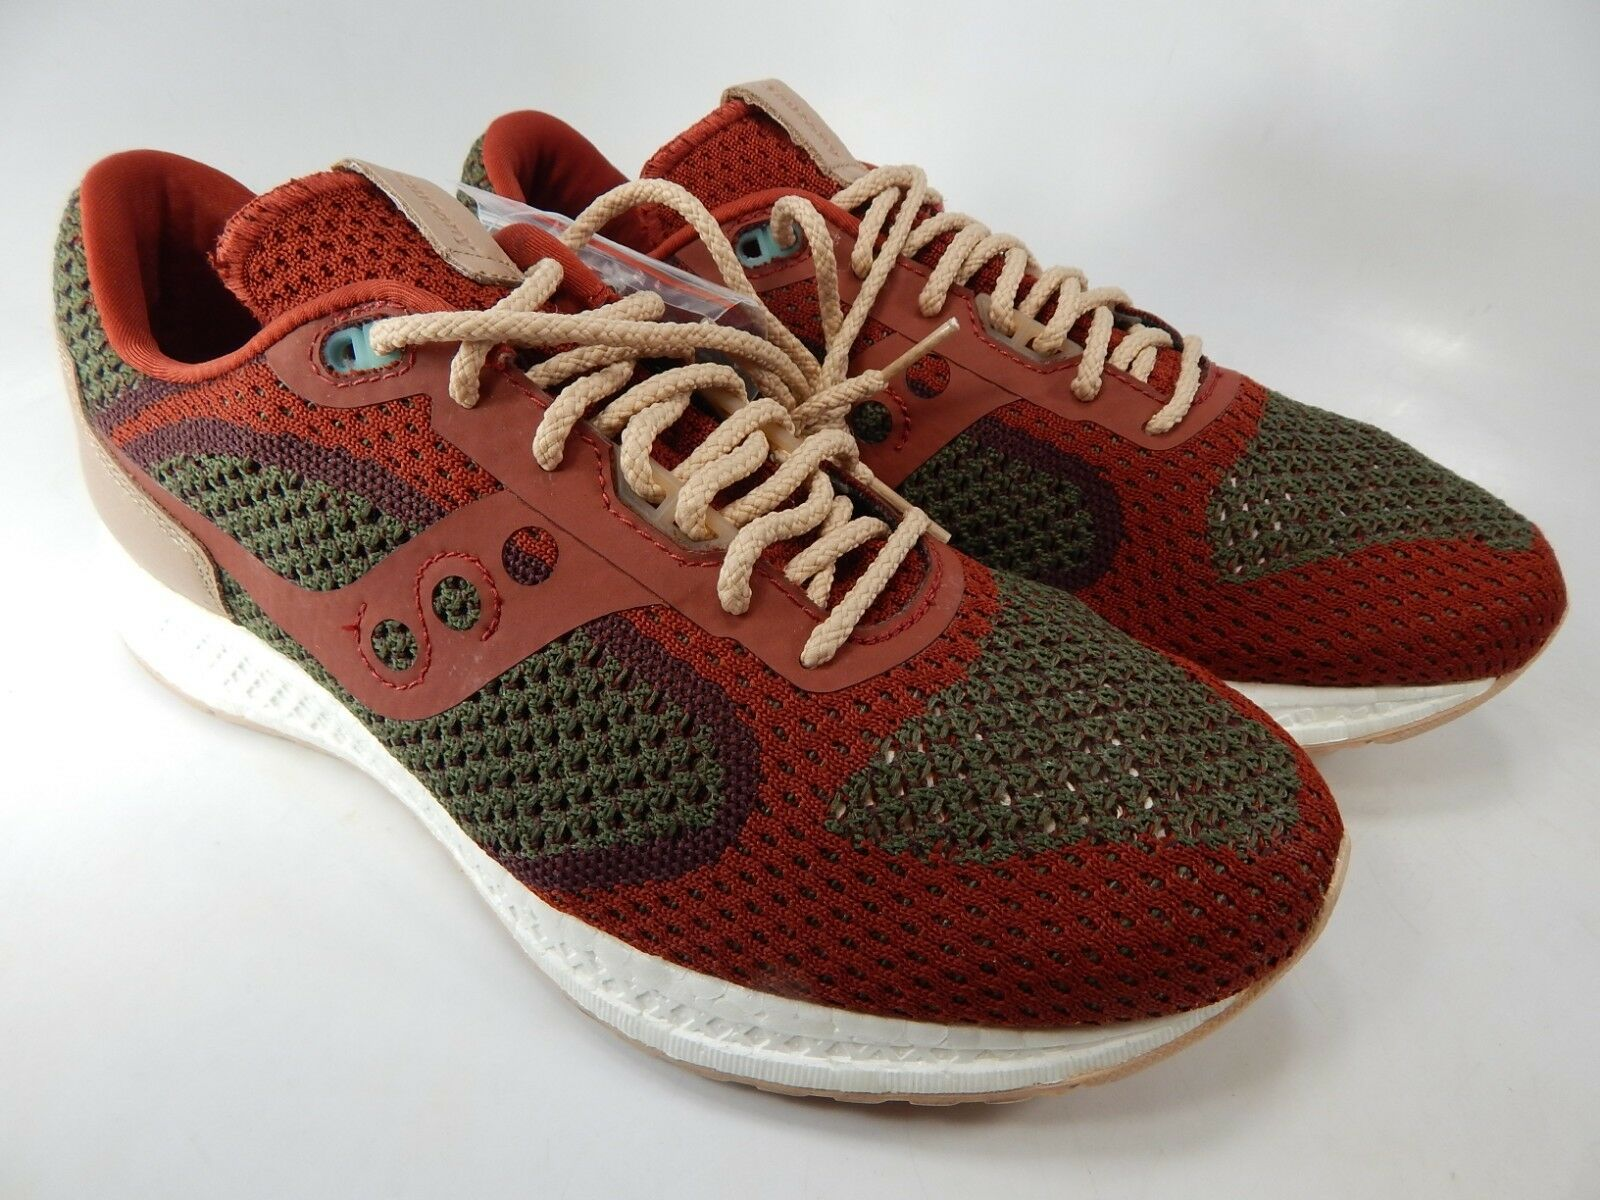 Saucony Shadow 5000 EVR Original S70396-1 Sz 9 M (D) Men's Running shoes